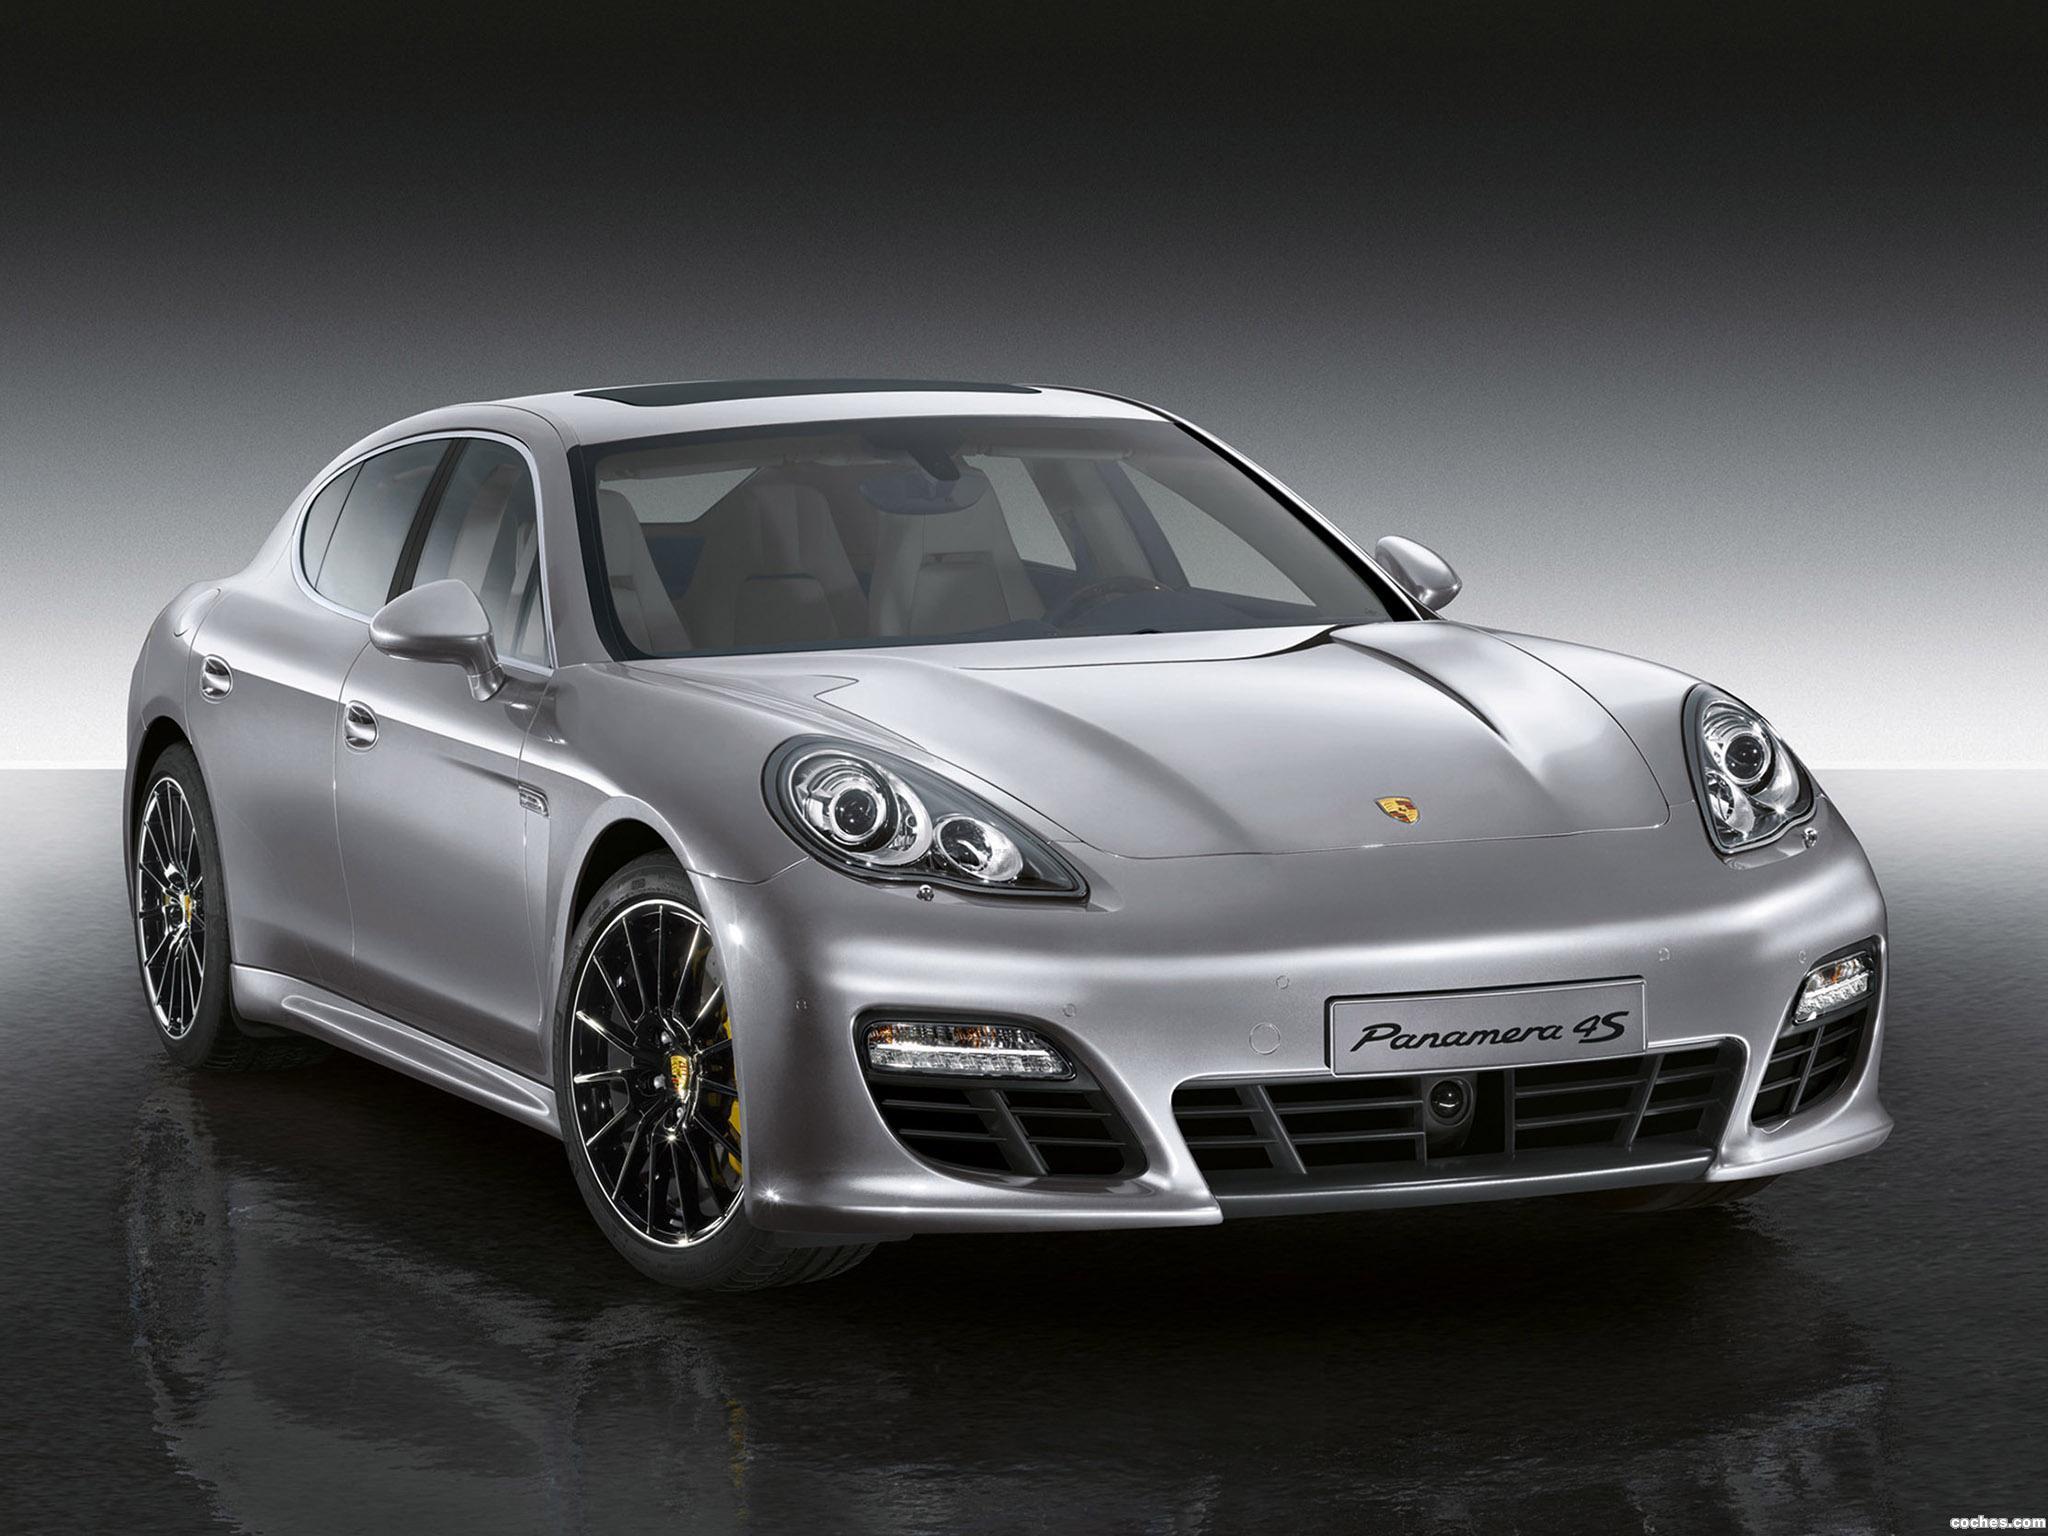 Foto 0 de Porsche Panamera 4S Sport Design 2010